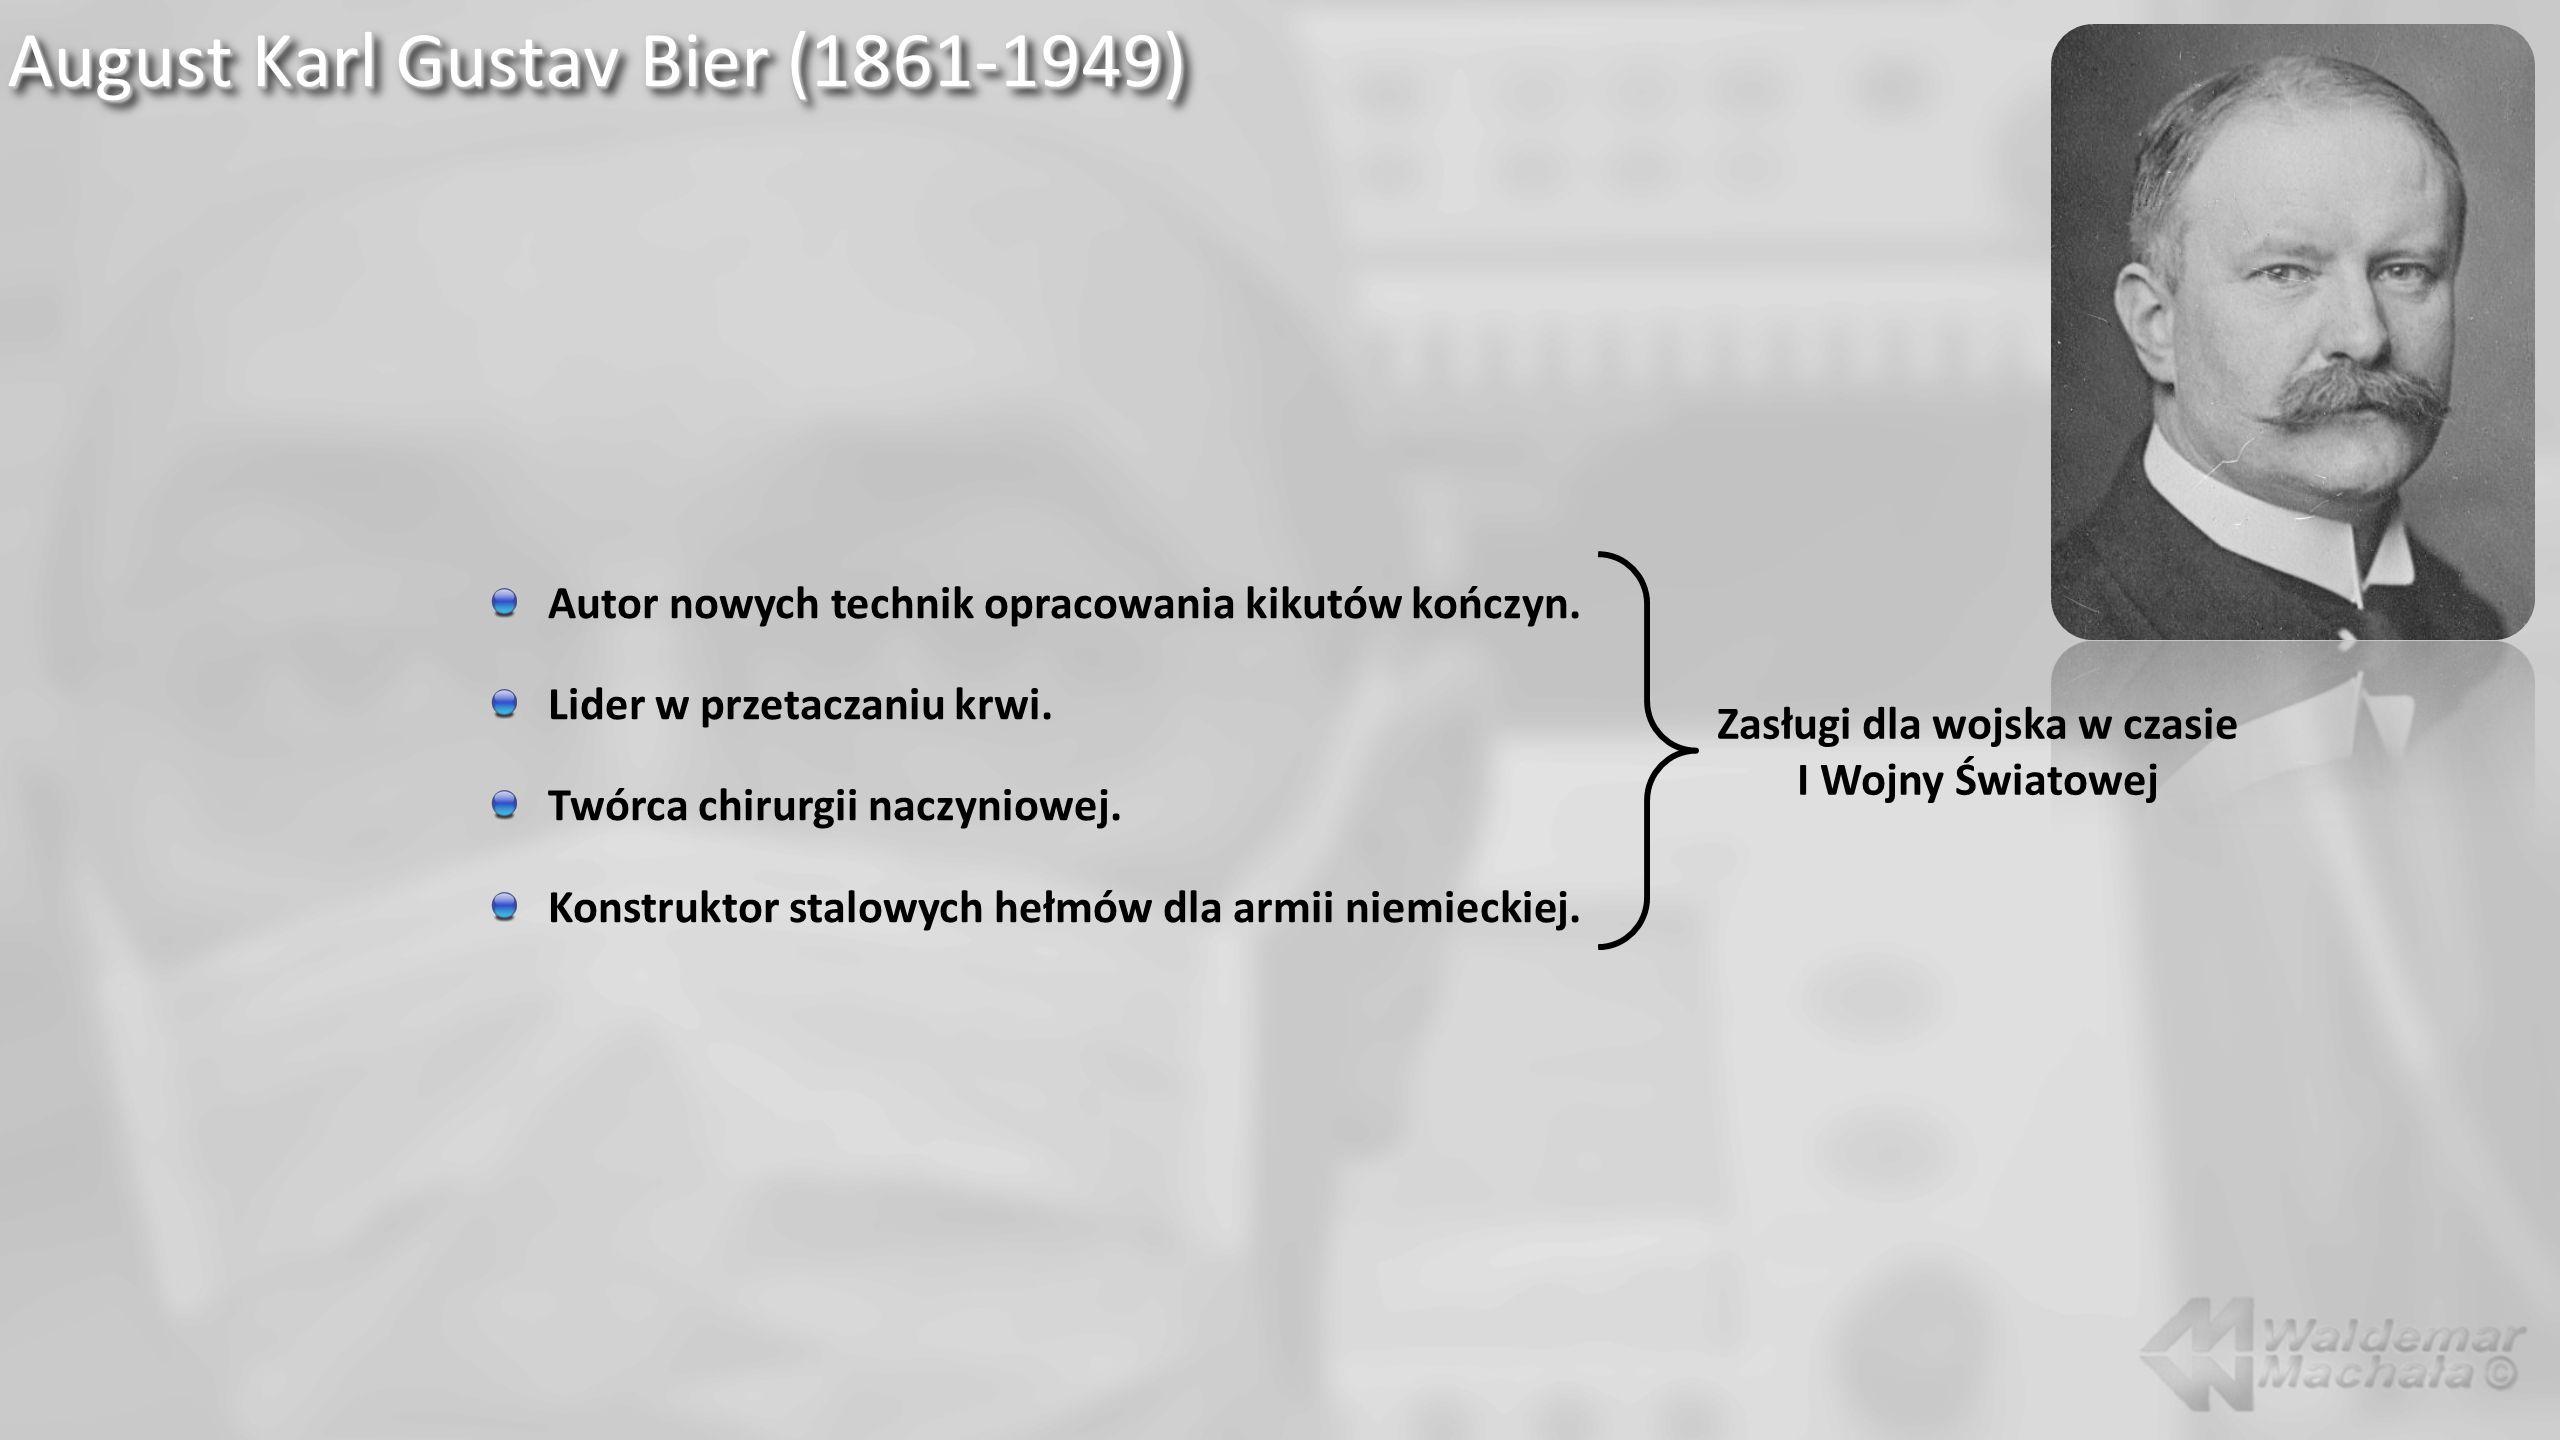 August Karl Gustav Bier (1861-1949)